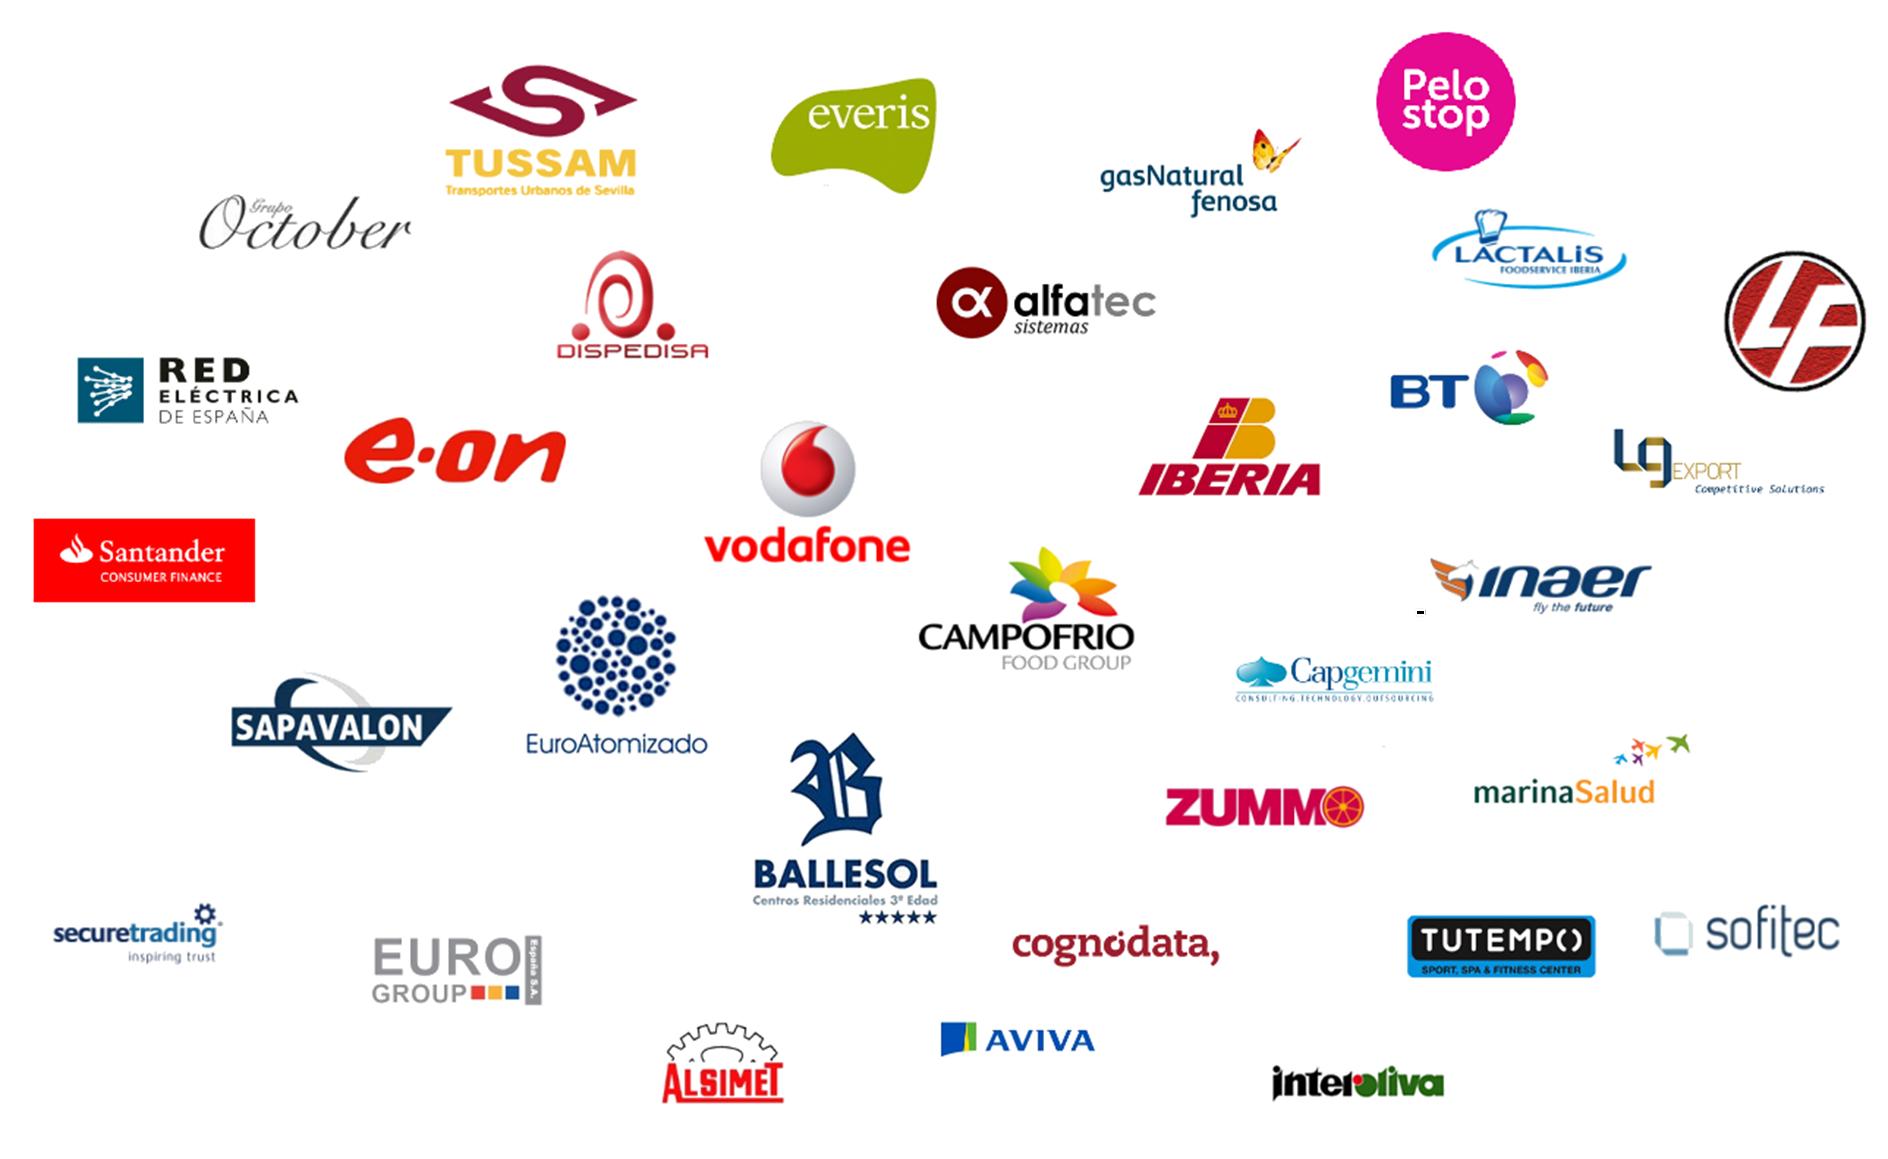 logos-referencias3